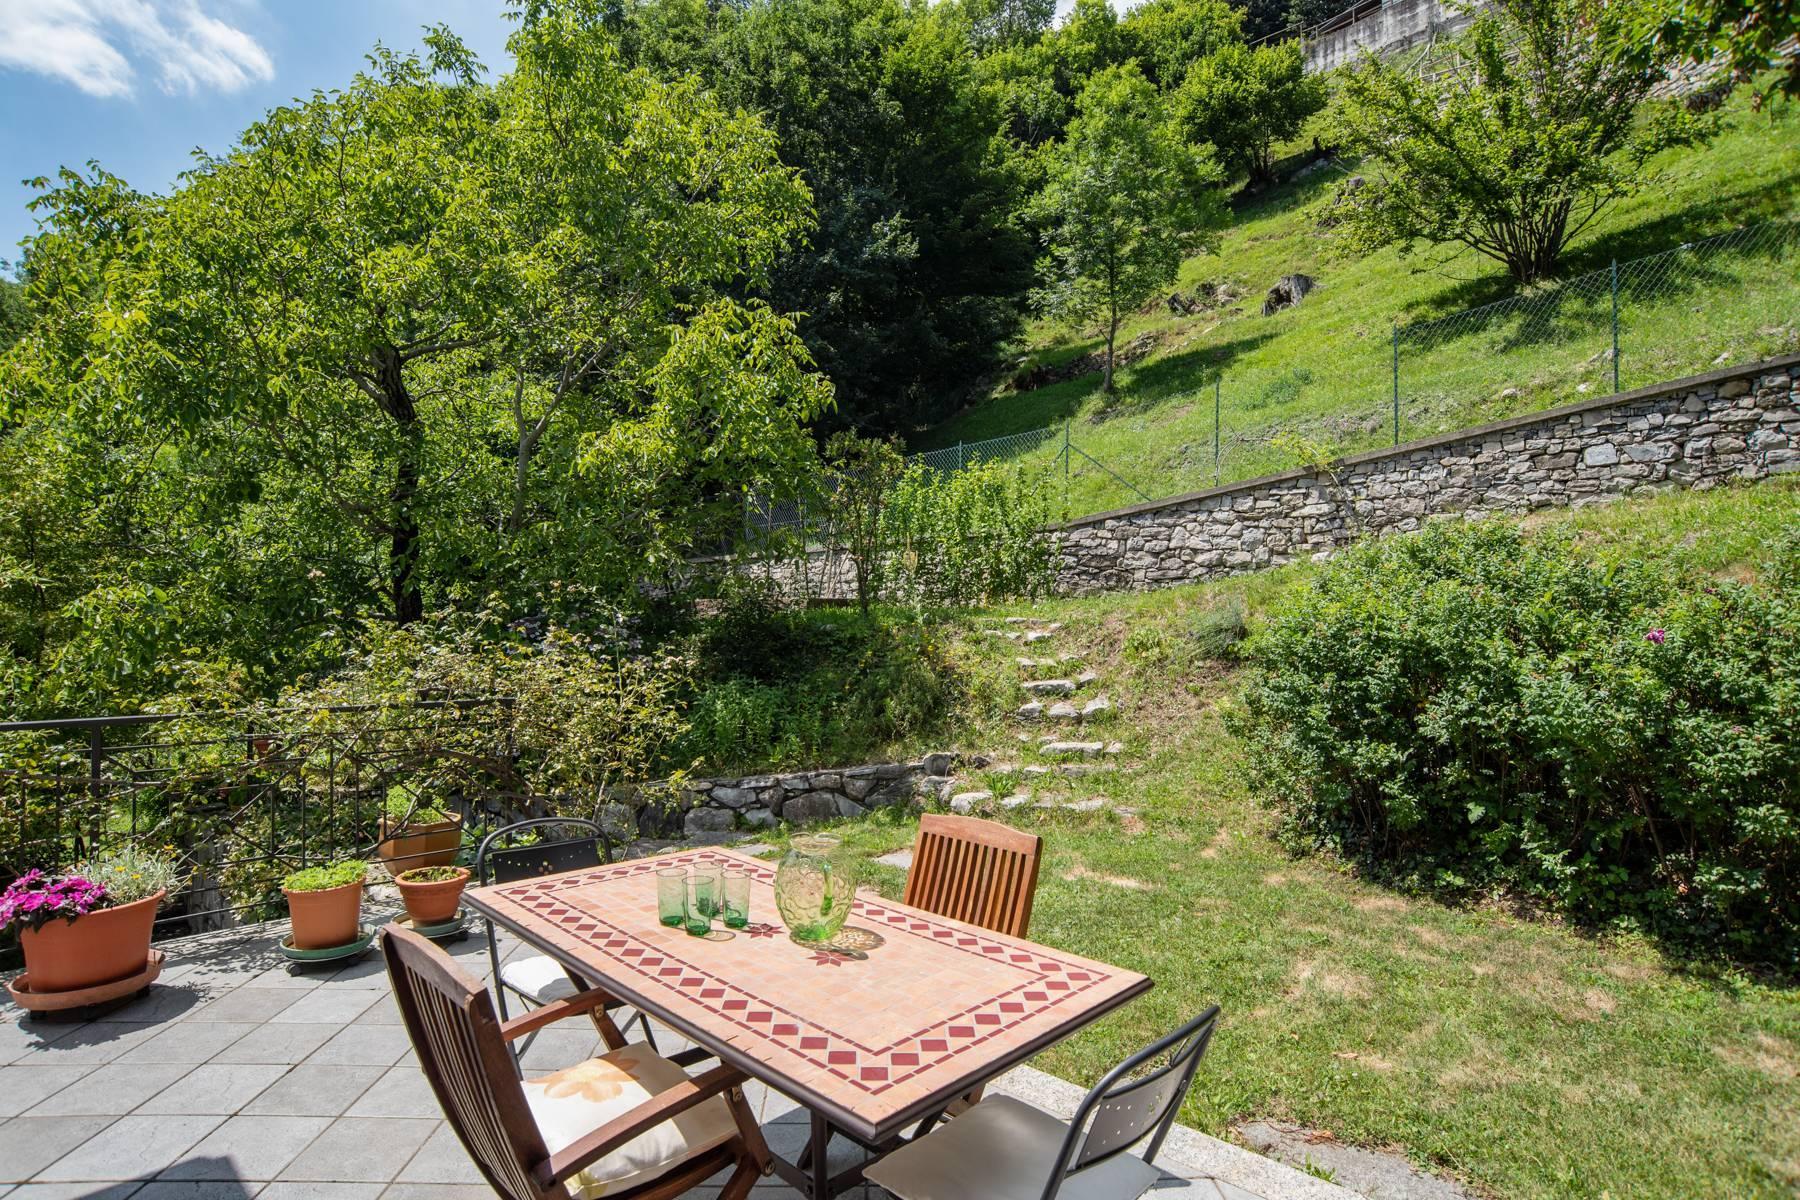 Splendida villa moderna sulla collina soleggiata sopra Argegno - 13